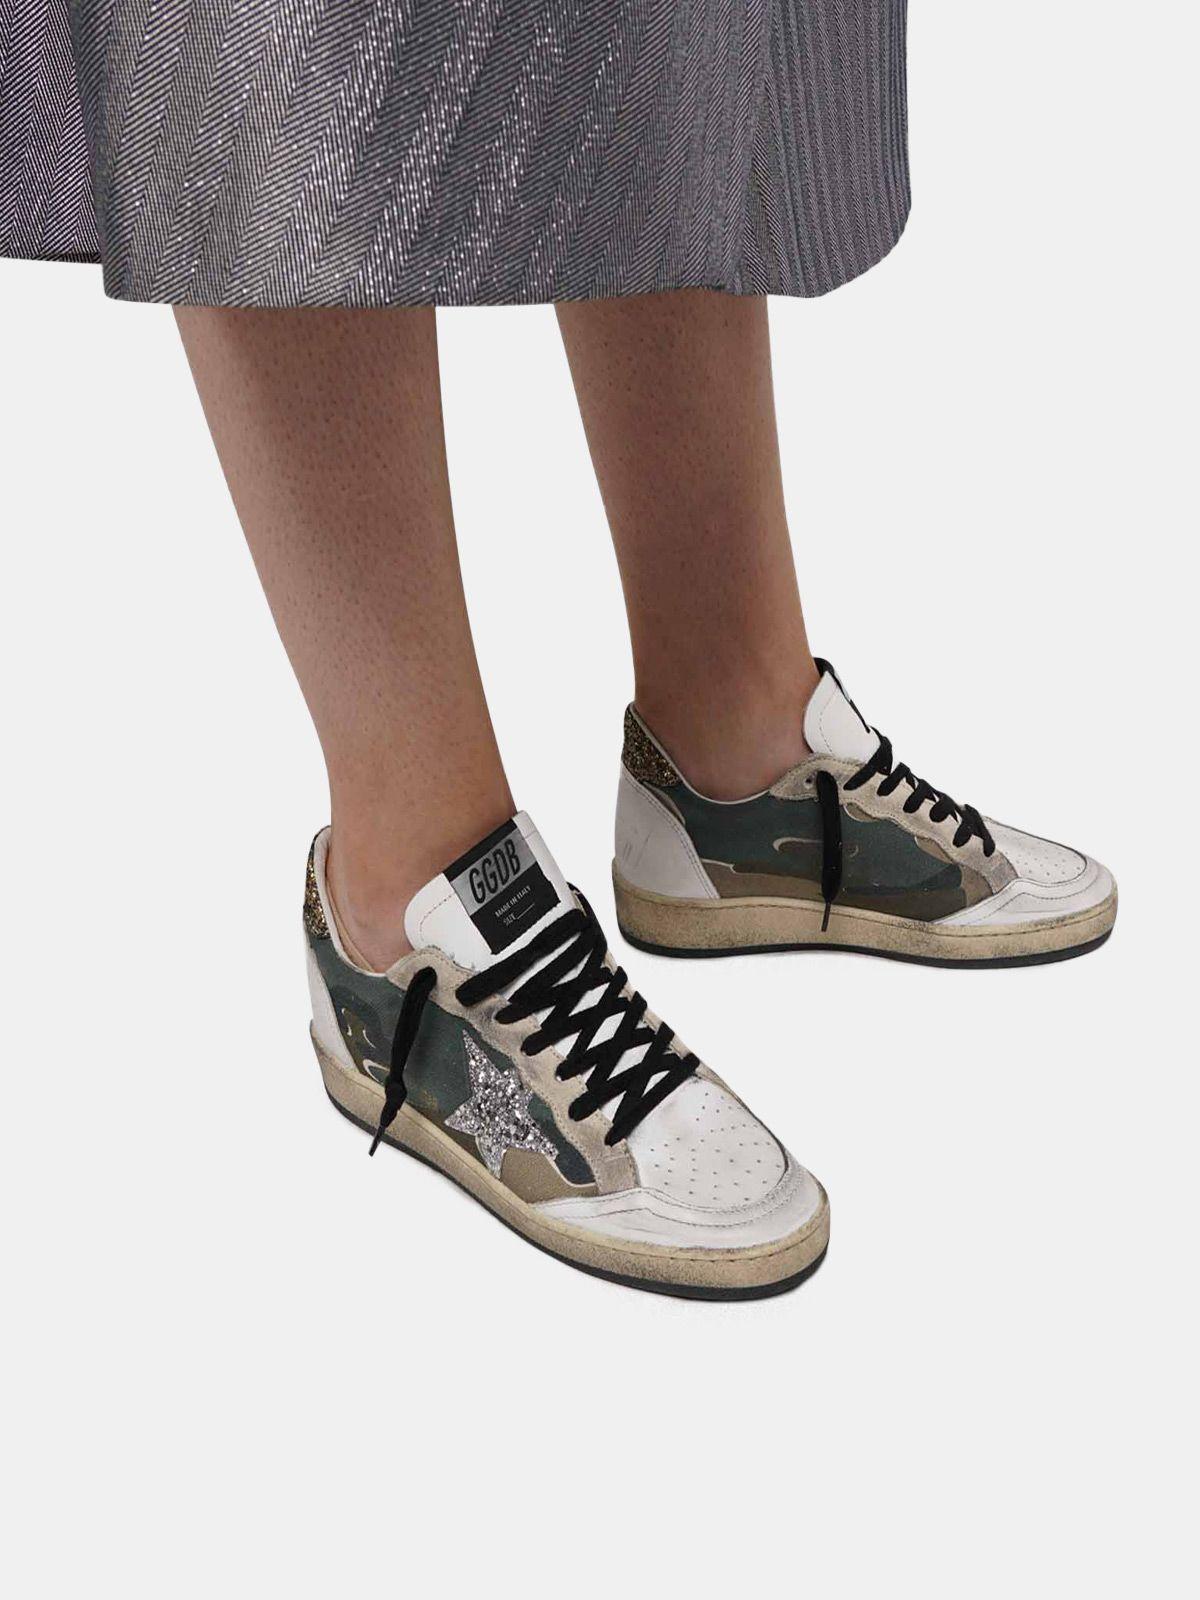 Golden Goose - Sneakers Ball Star camouflage con stella e talloncino glitter in